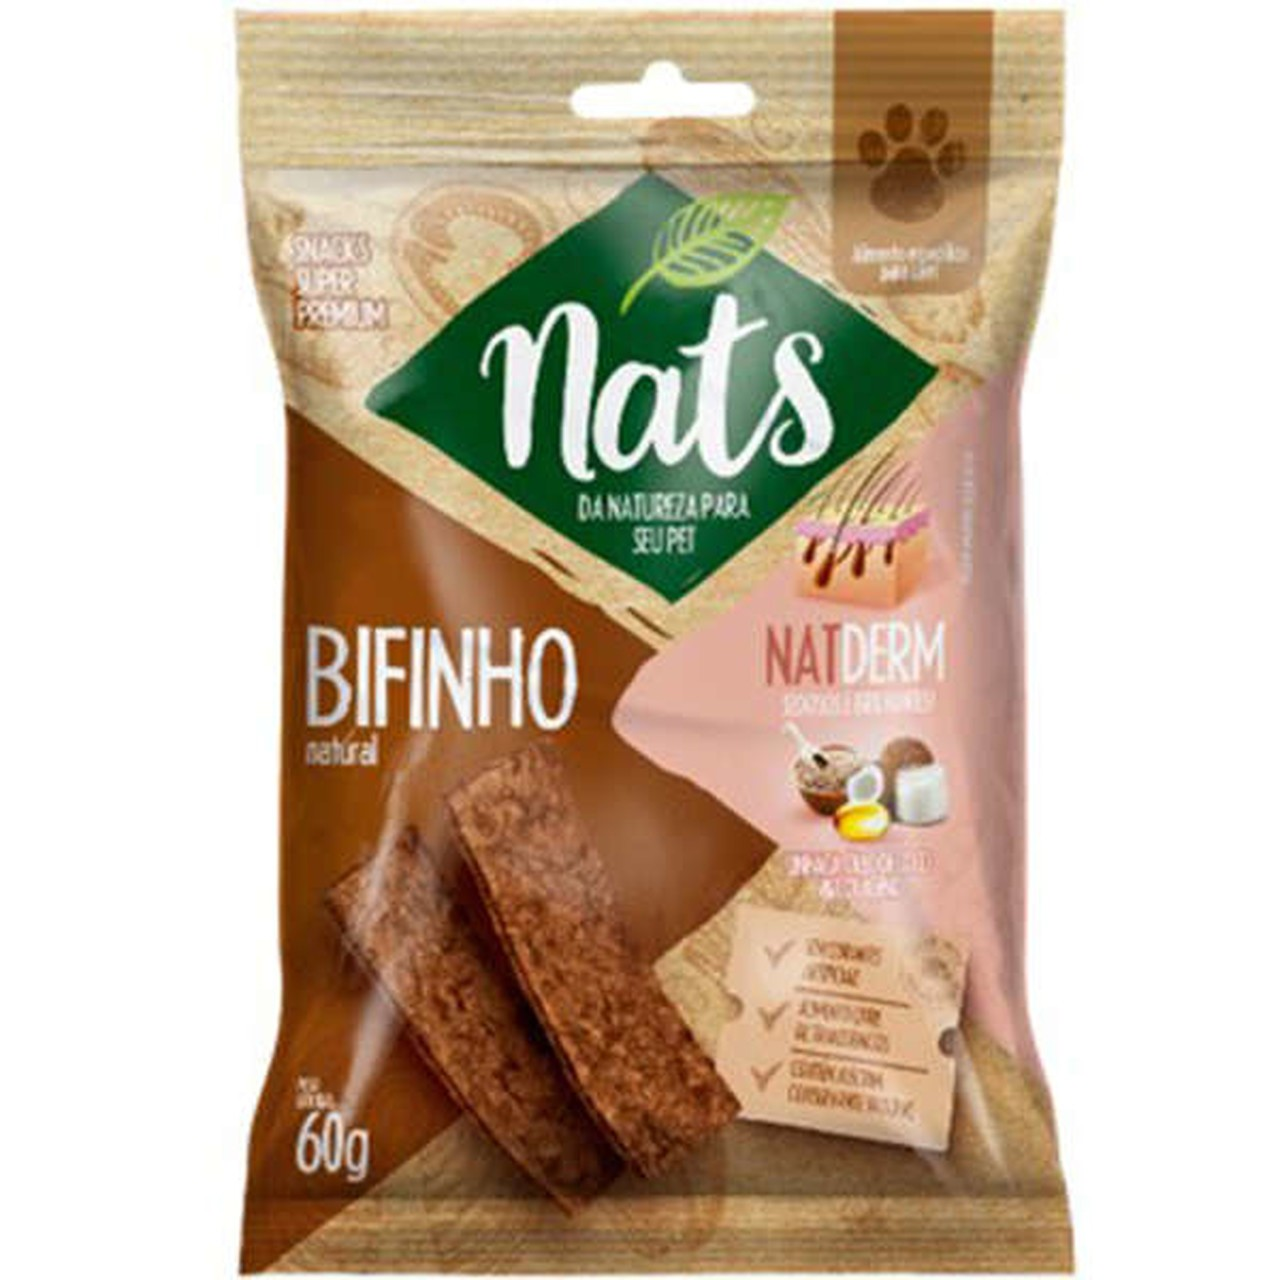 Bifinho Natural Nats NatDerm para Cães 60g